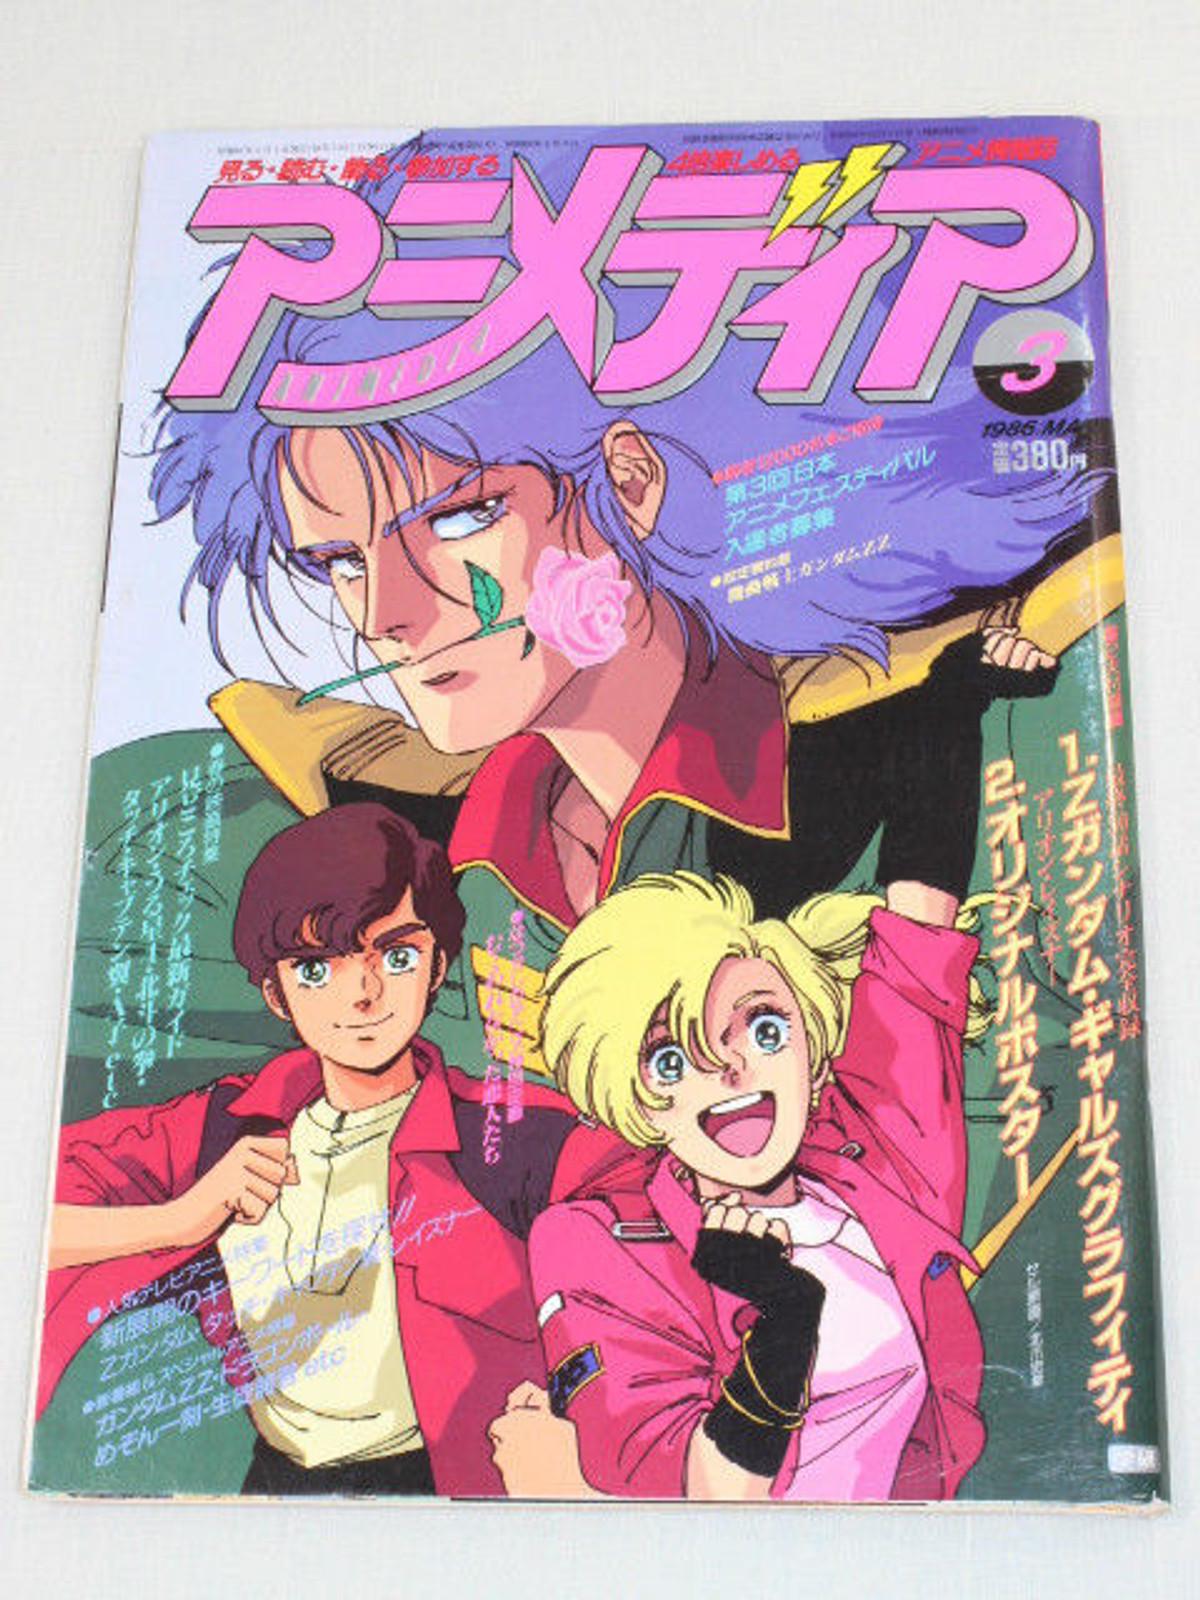 Animedia Japan Anime Magazine 03/1986 Vol.60 Gakken / ARION DRAGON BALL Z GUNDAM